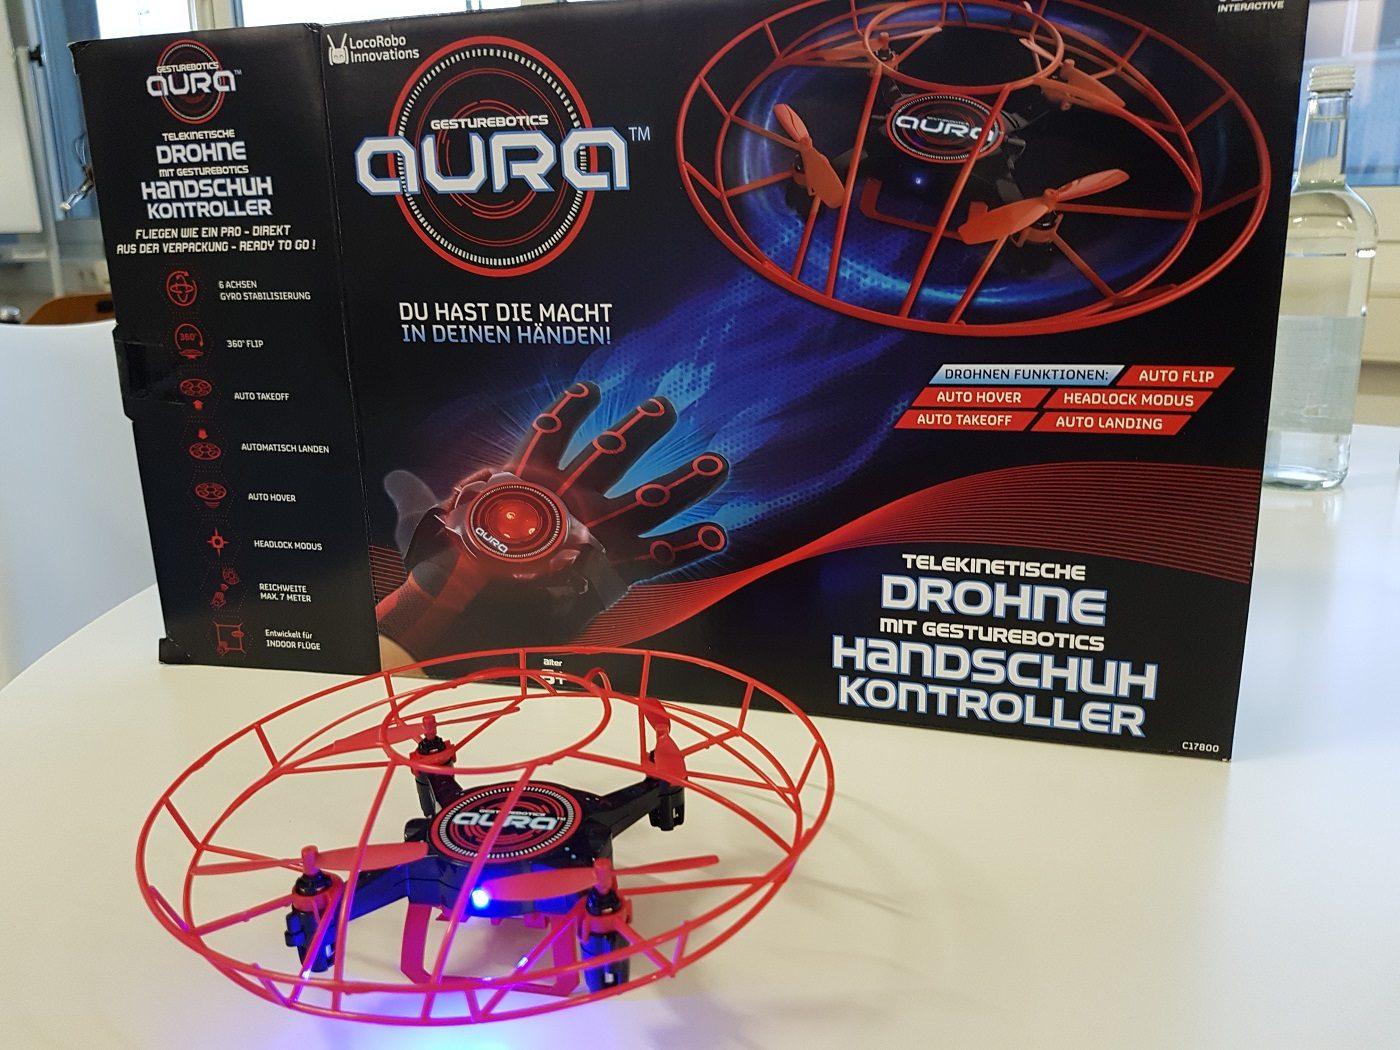 Aura gestengesteuerte Drohne Paket